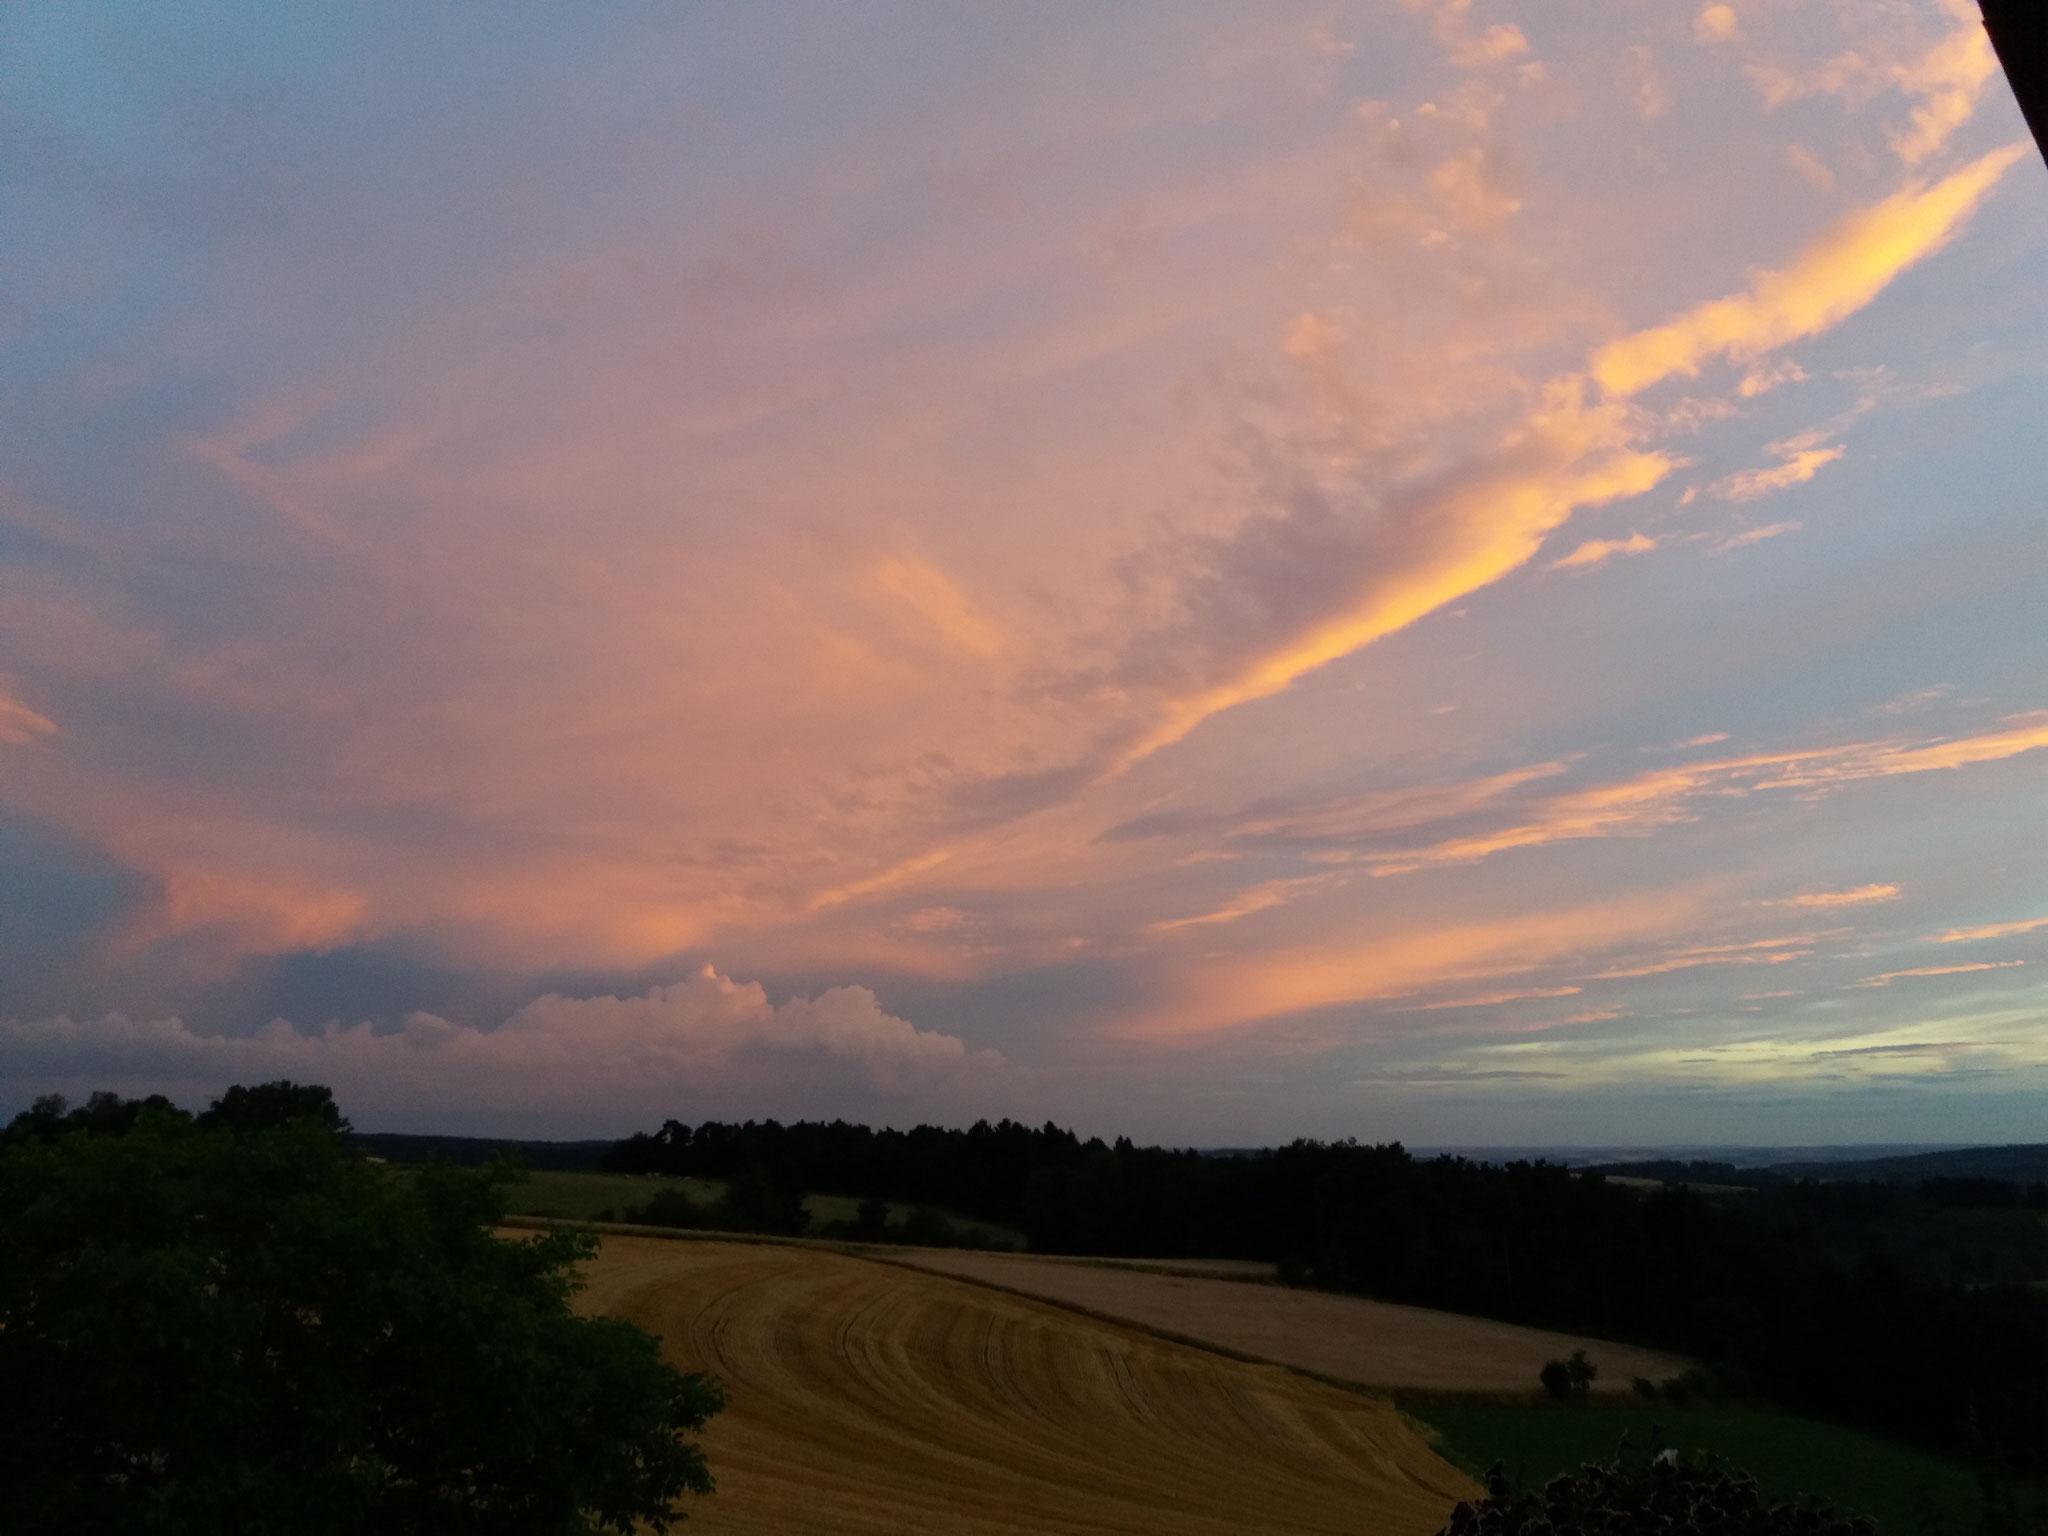 Blick auf Reiting (Abendhimmel im Juli 2017)